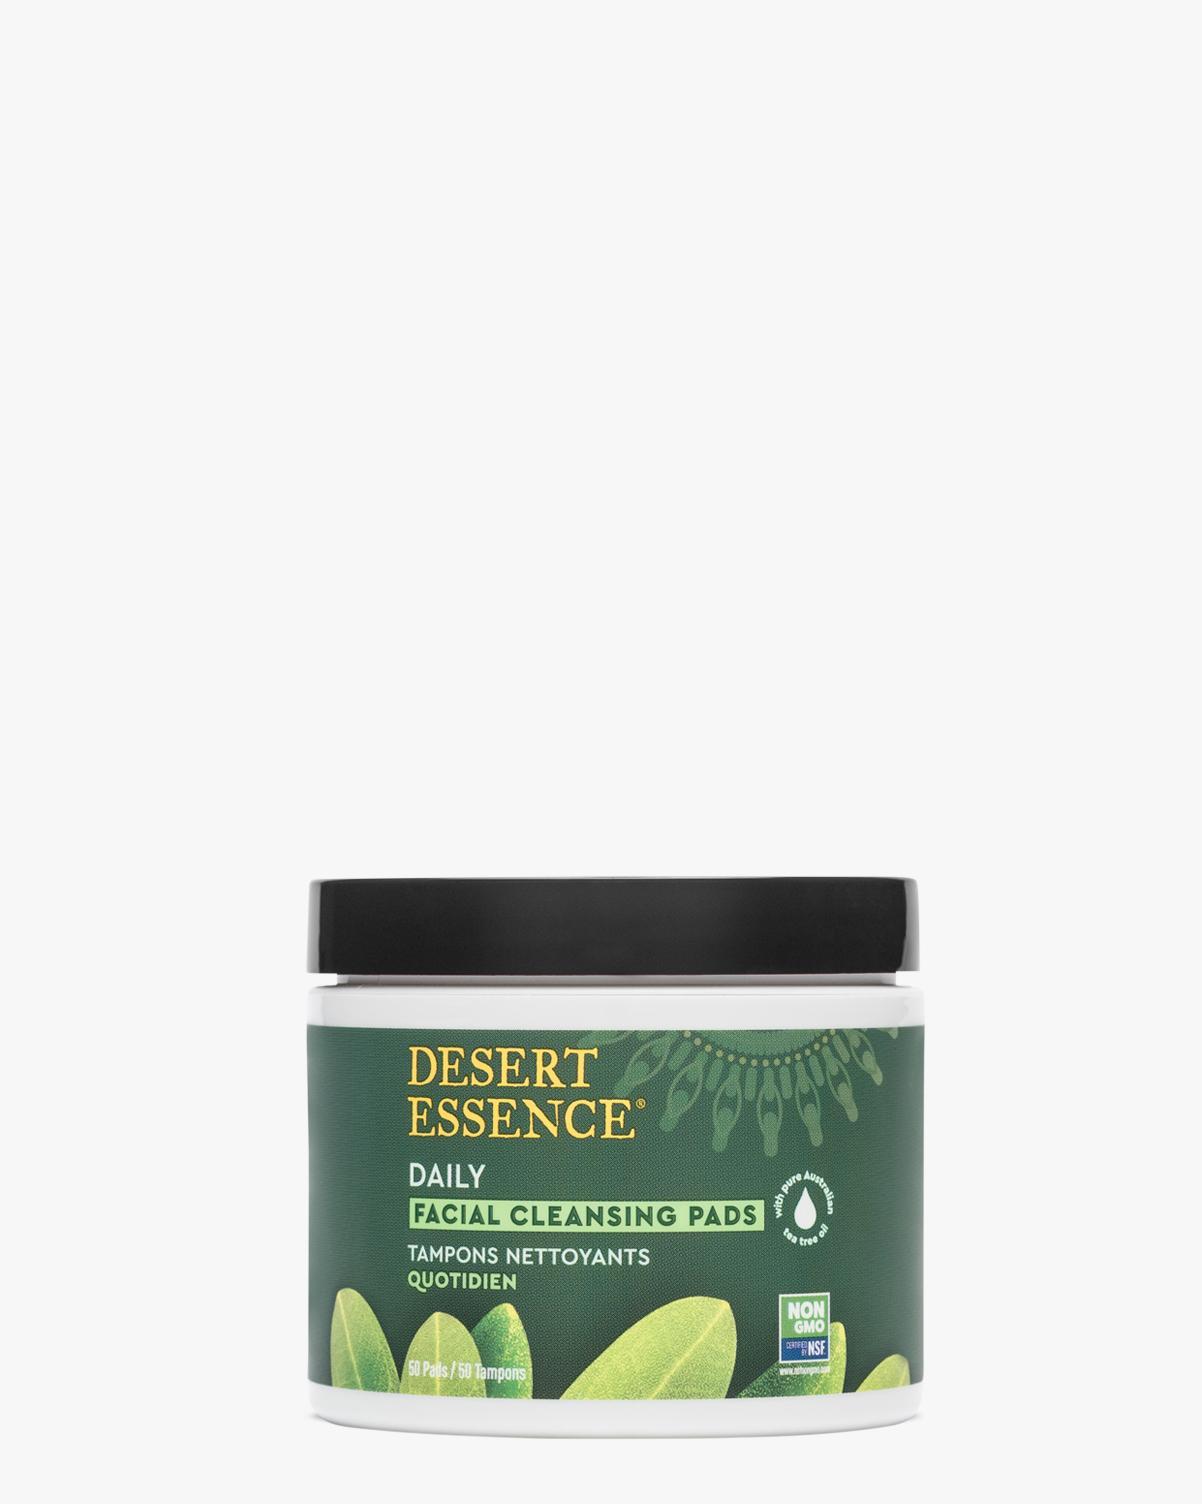 Desert Essence coupon: Desert Essence Tea Tree Oil Facial Cleansing Pads, 50 pads | Vegan | Gluten-Free